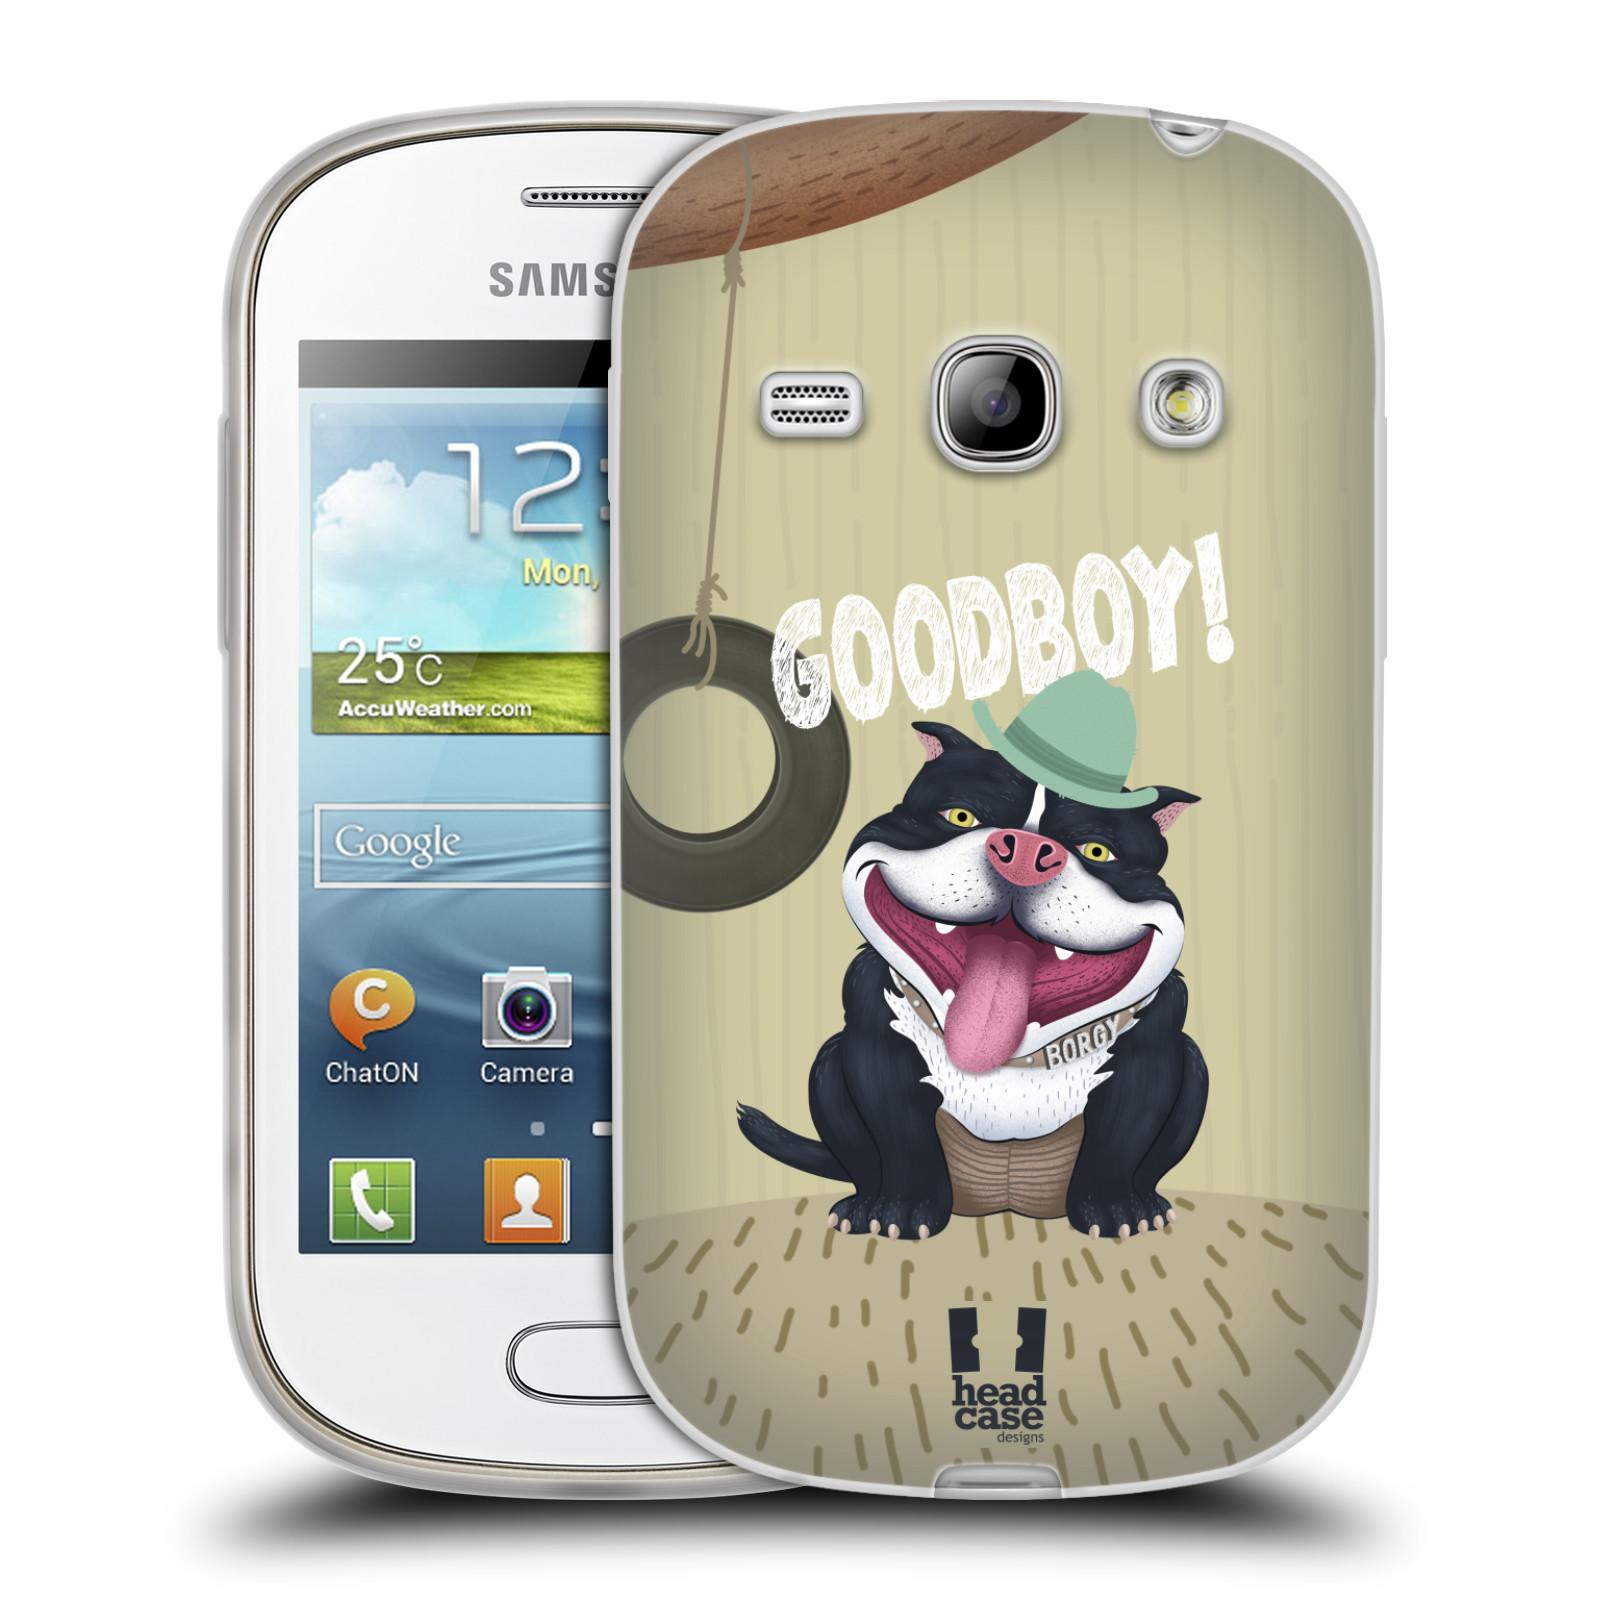 Silikonové pouzdro na mobil Samsung Galaxy Fame HEAD CASE Goodboy! Pejsek (Silikonový kryt či obal na mobilní telefon Samsung Galaxy Fame GT-S6810)